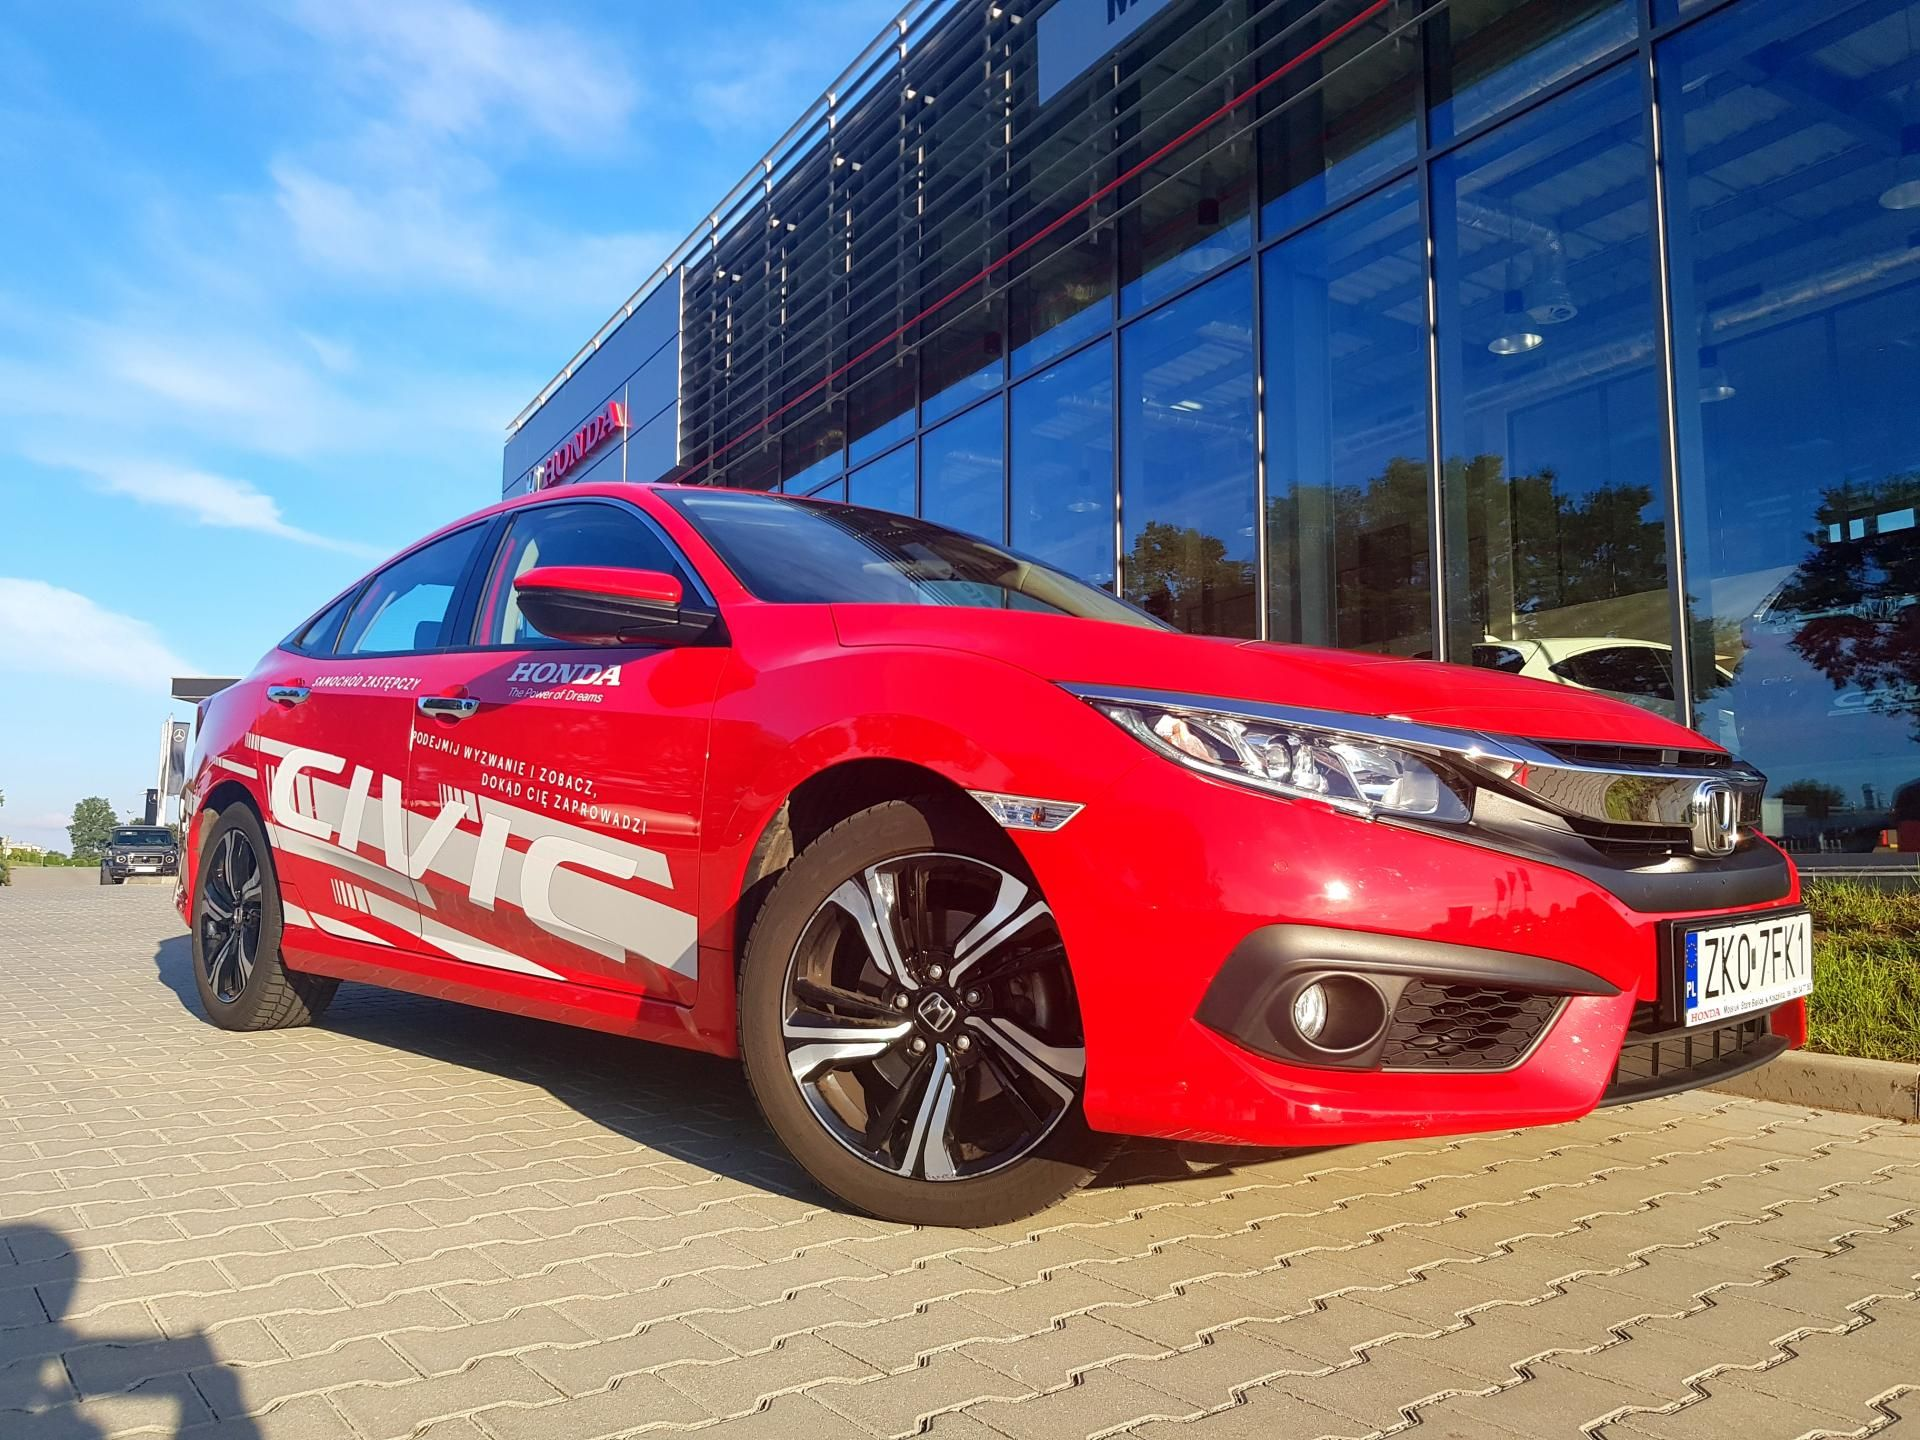 Honda Civic 1.5 Elegance  2019 Samochód zastępczy Dealera